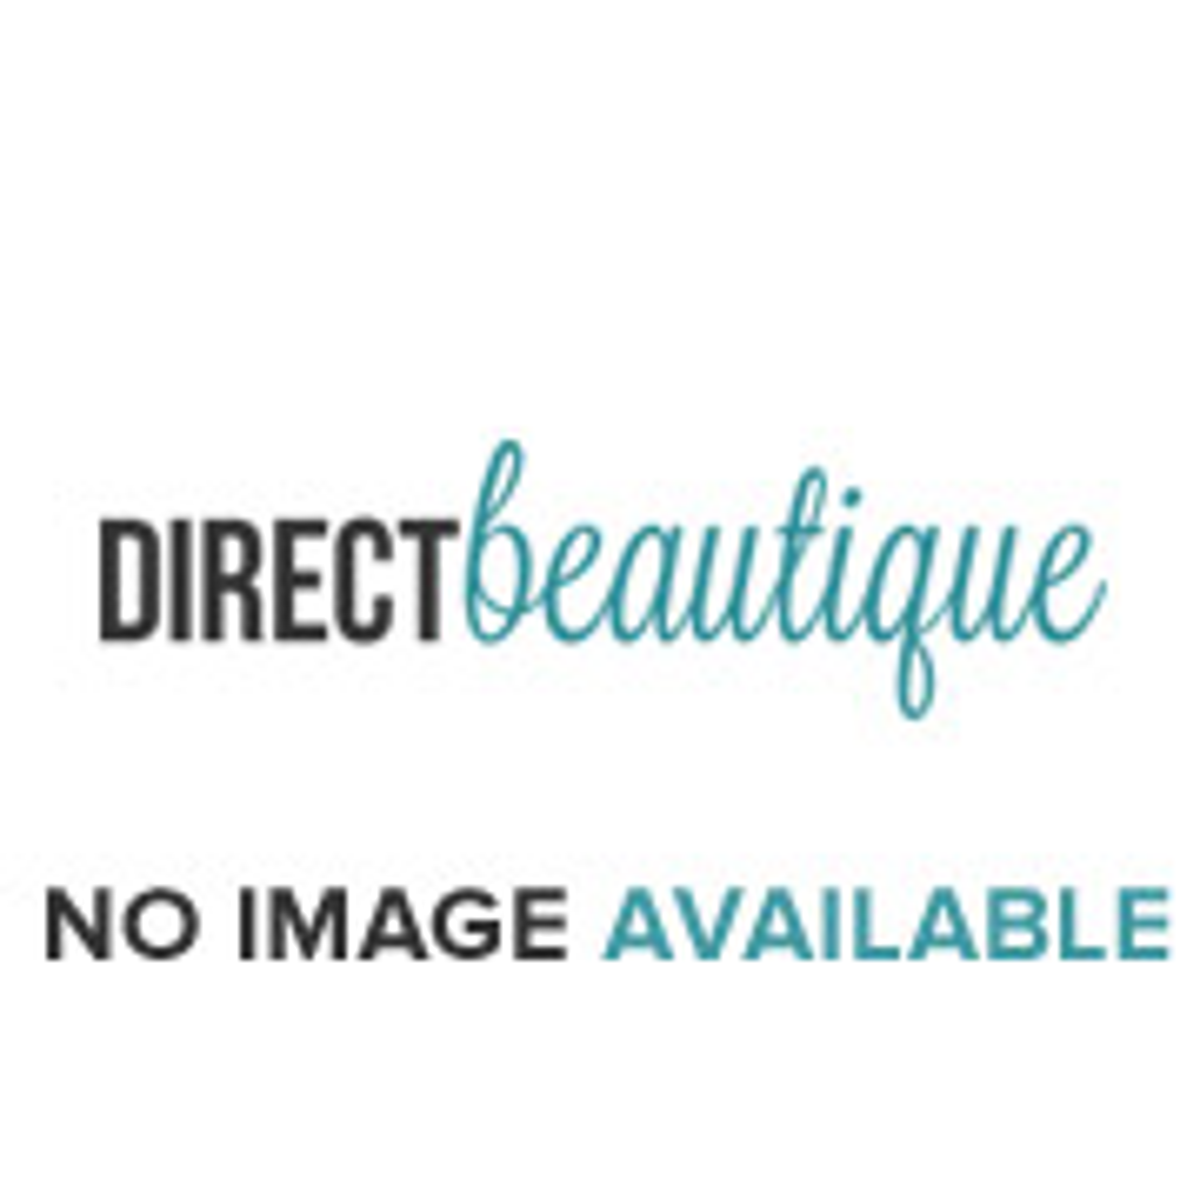 Thierry Mugler Angel 25ml EDP Spray + Metal Cuff Bracelet